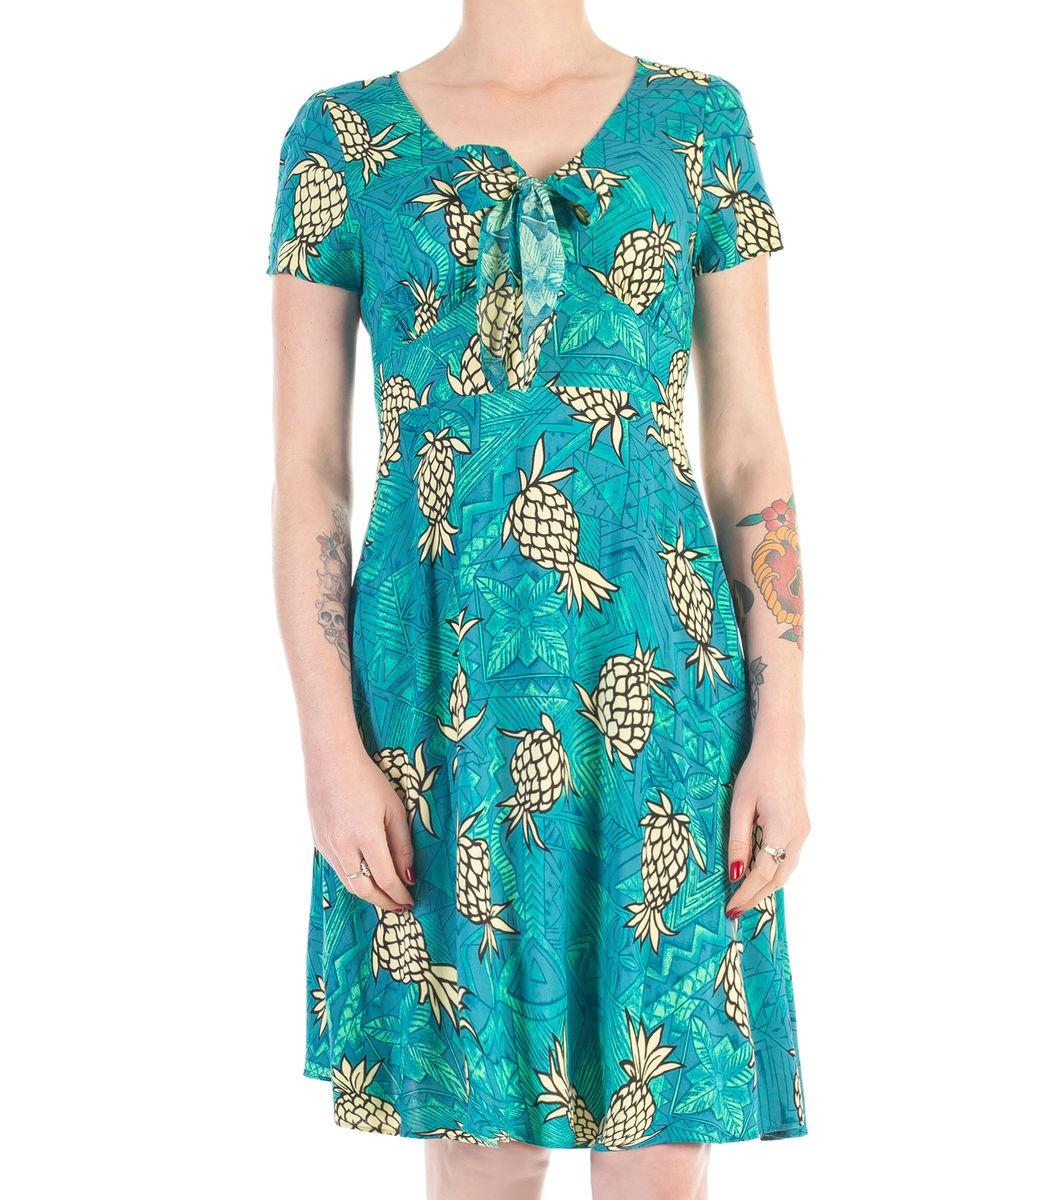 Diana Dors Pineapple Dress